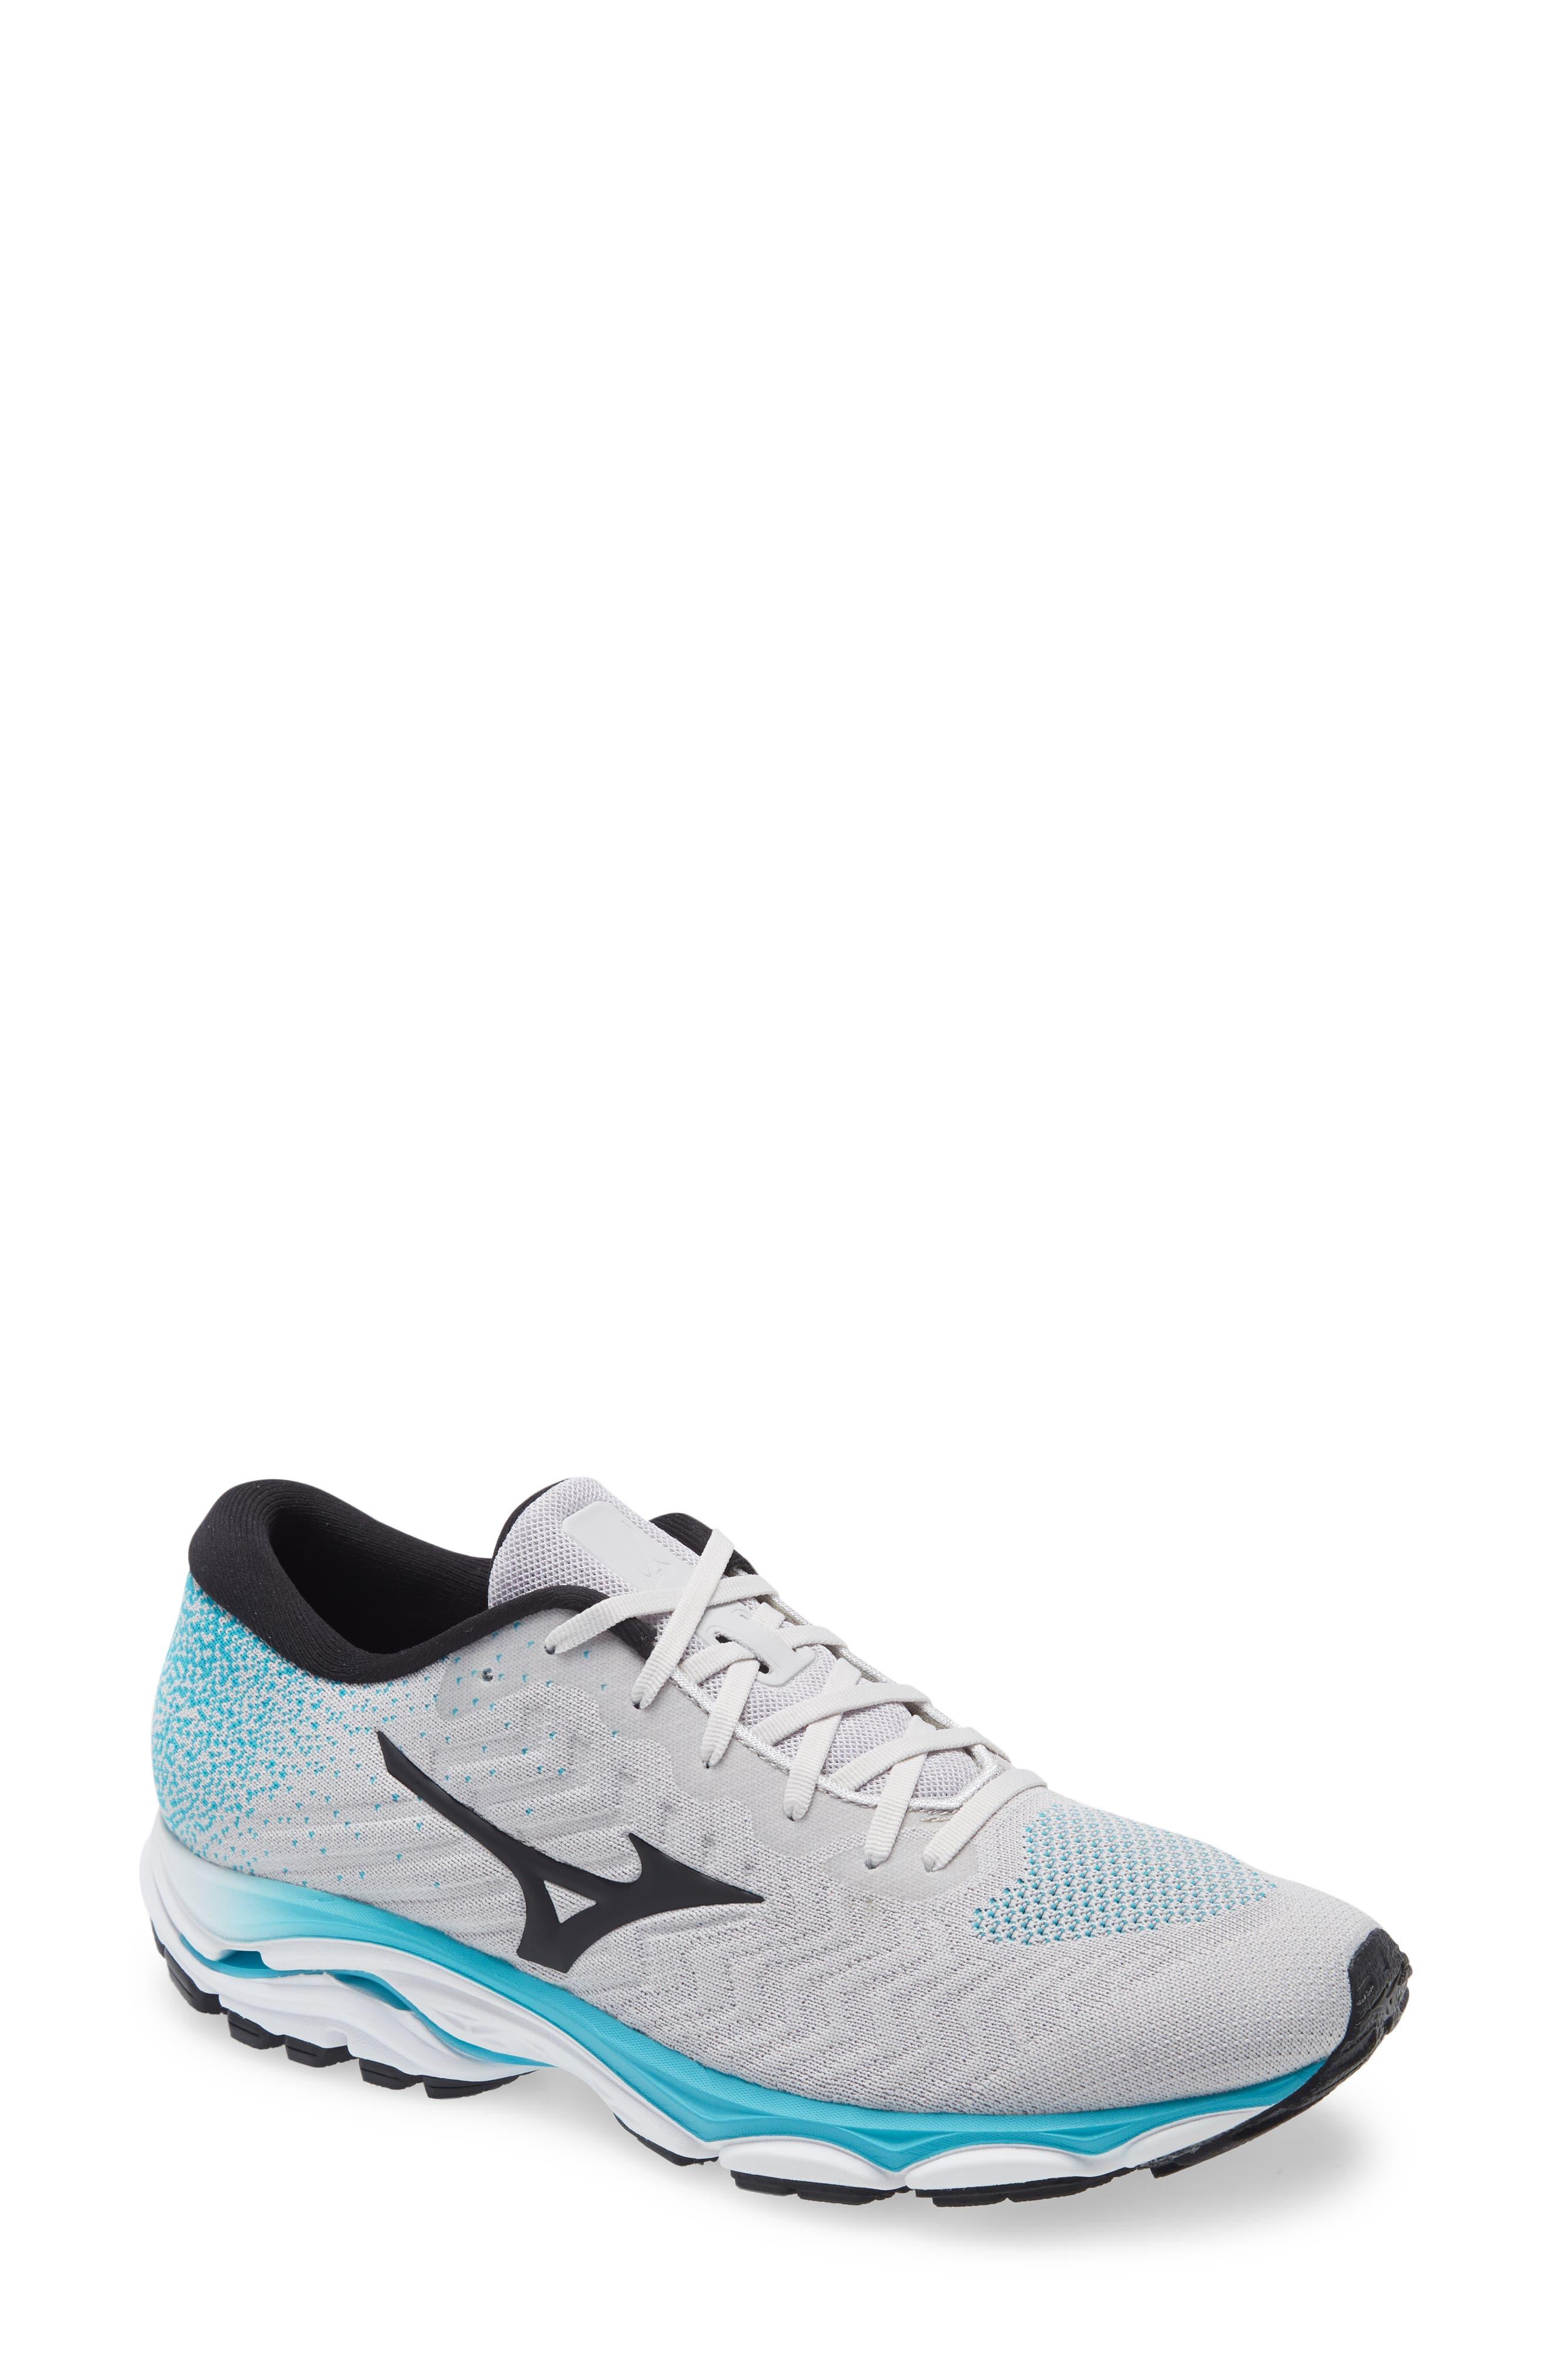 Wave Inspire 16 Running Shoe